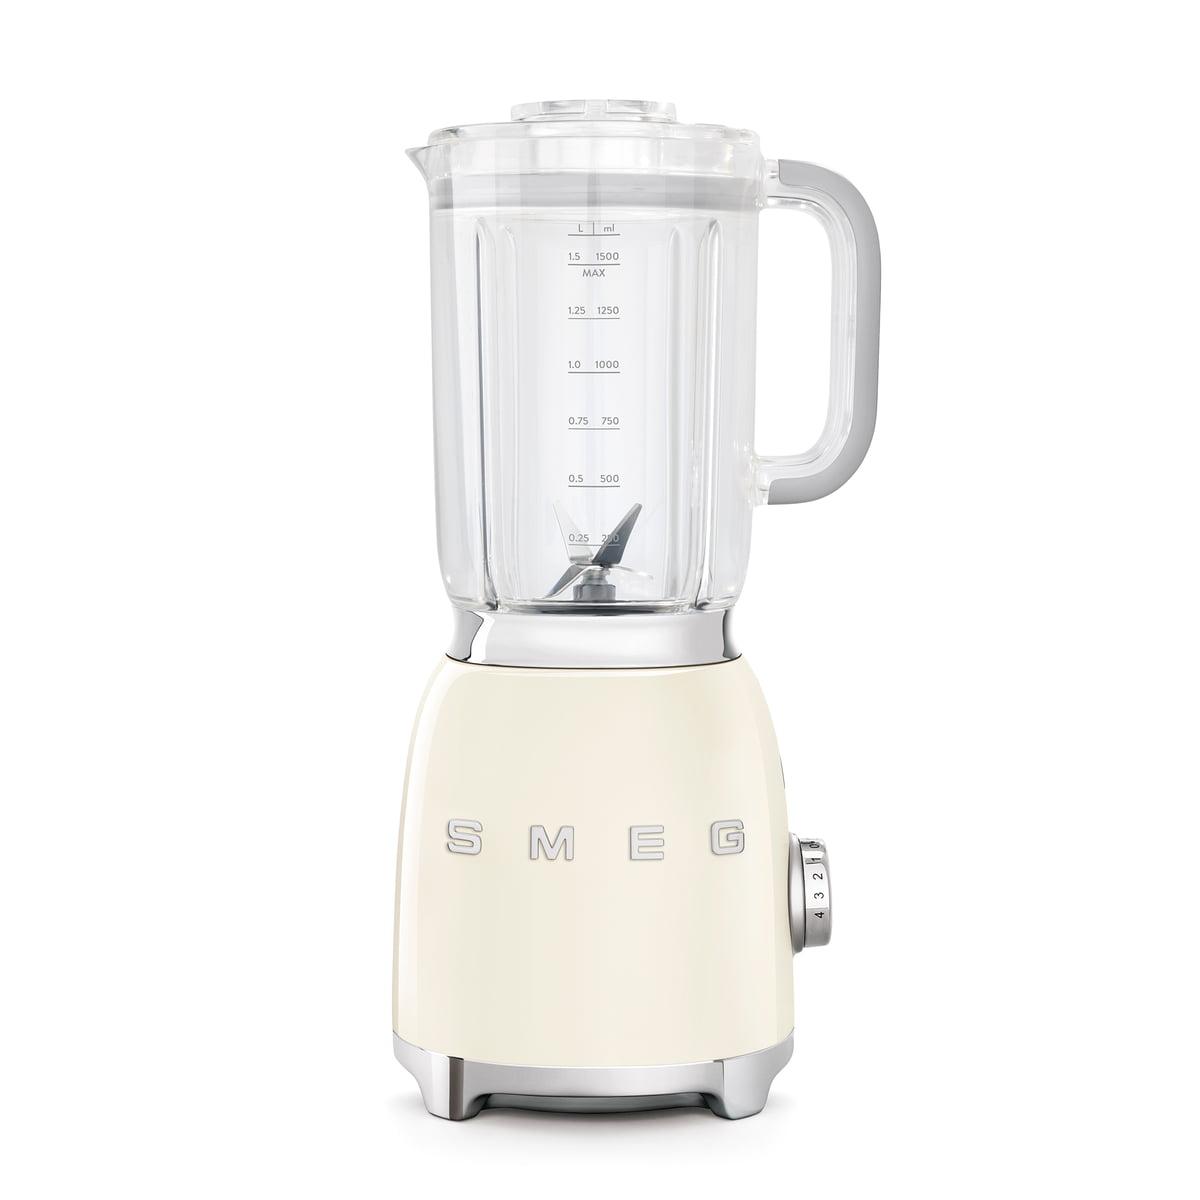 SMEG - Standmixer 1,5 l (BLF01), creme